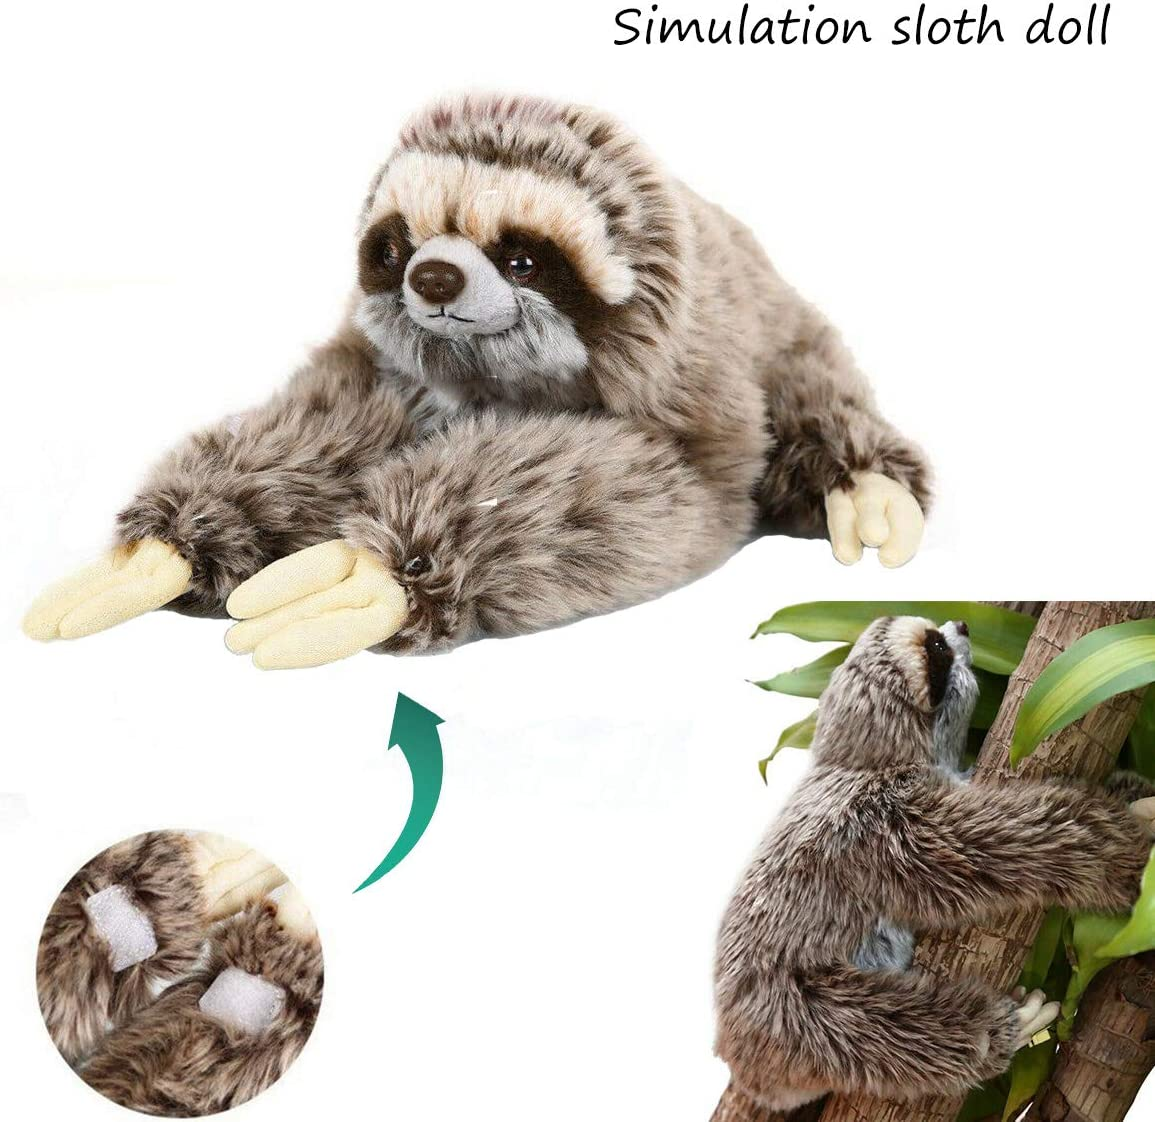 Cute Giant Sloth Stuffed Plush Animal Doll Soft Toys Pillow Cushion Xmas Gifts